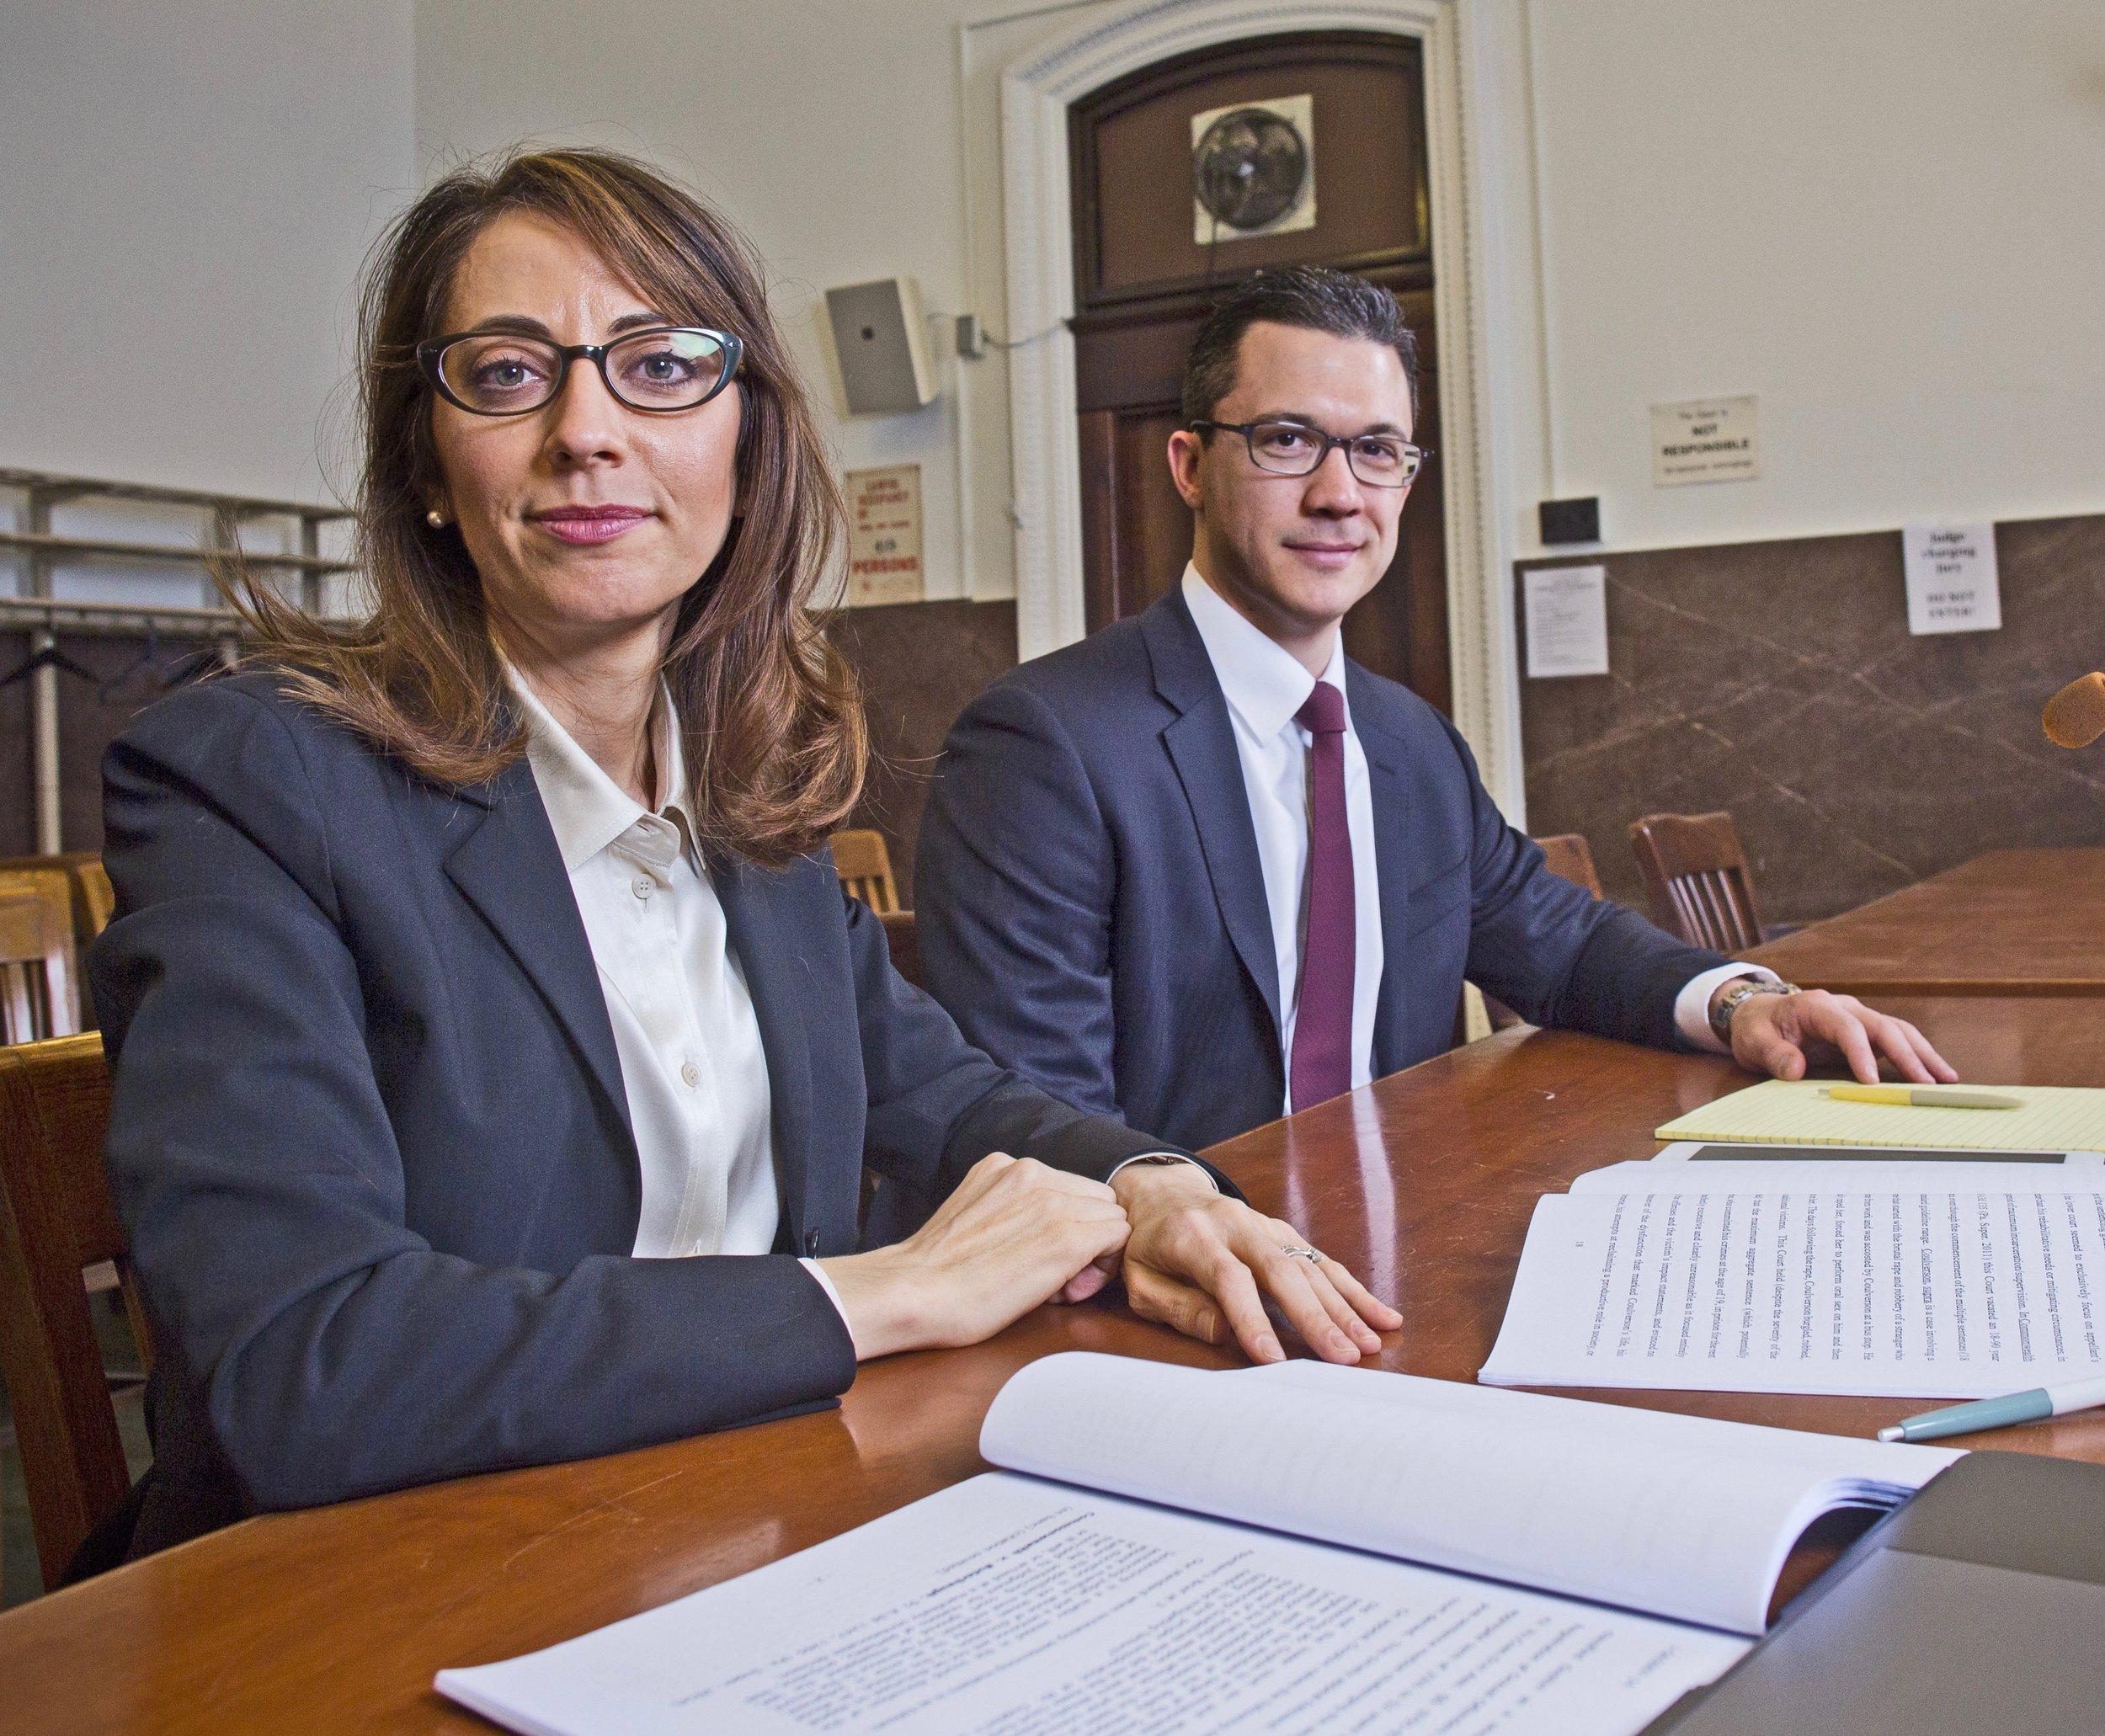 Philadelphia Criminal Defense Lawyers Demetra Mehta and Zak Goldstein